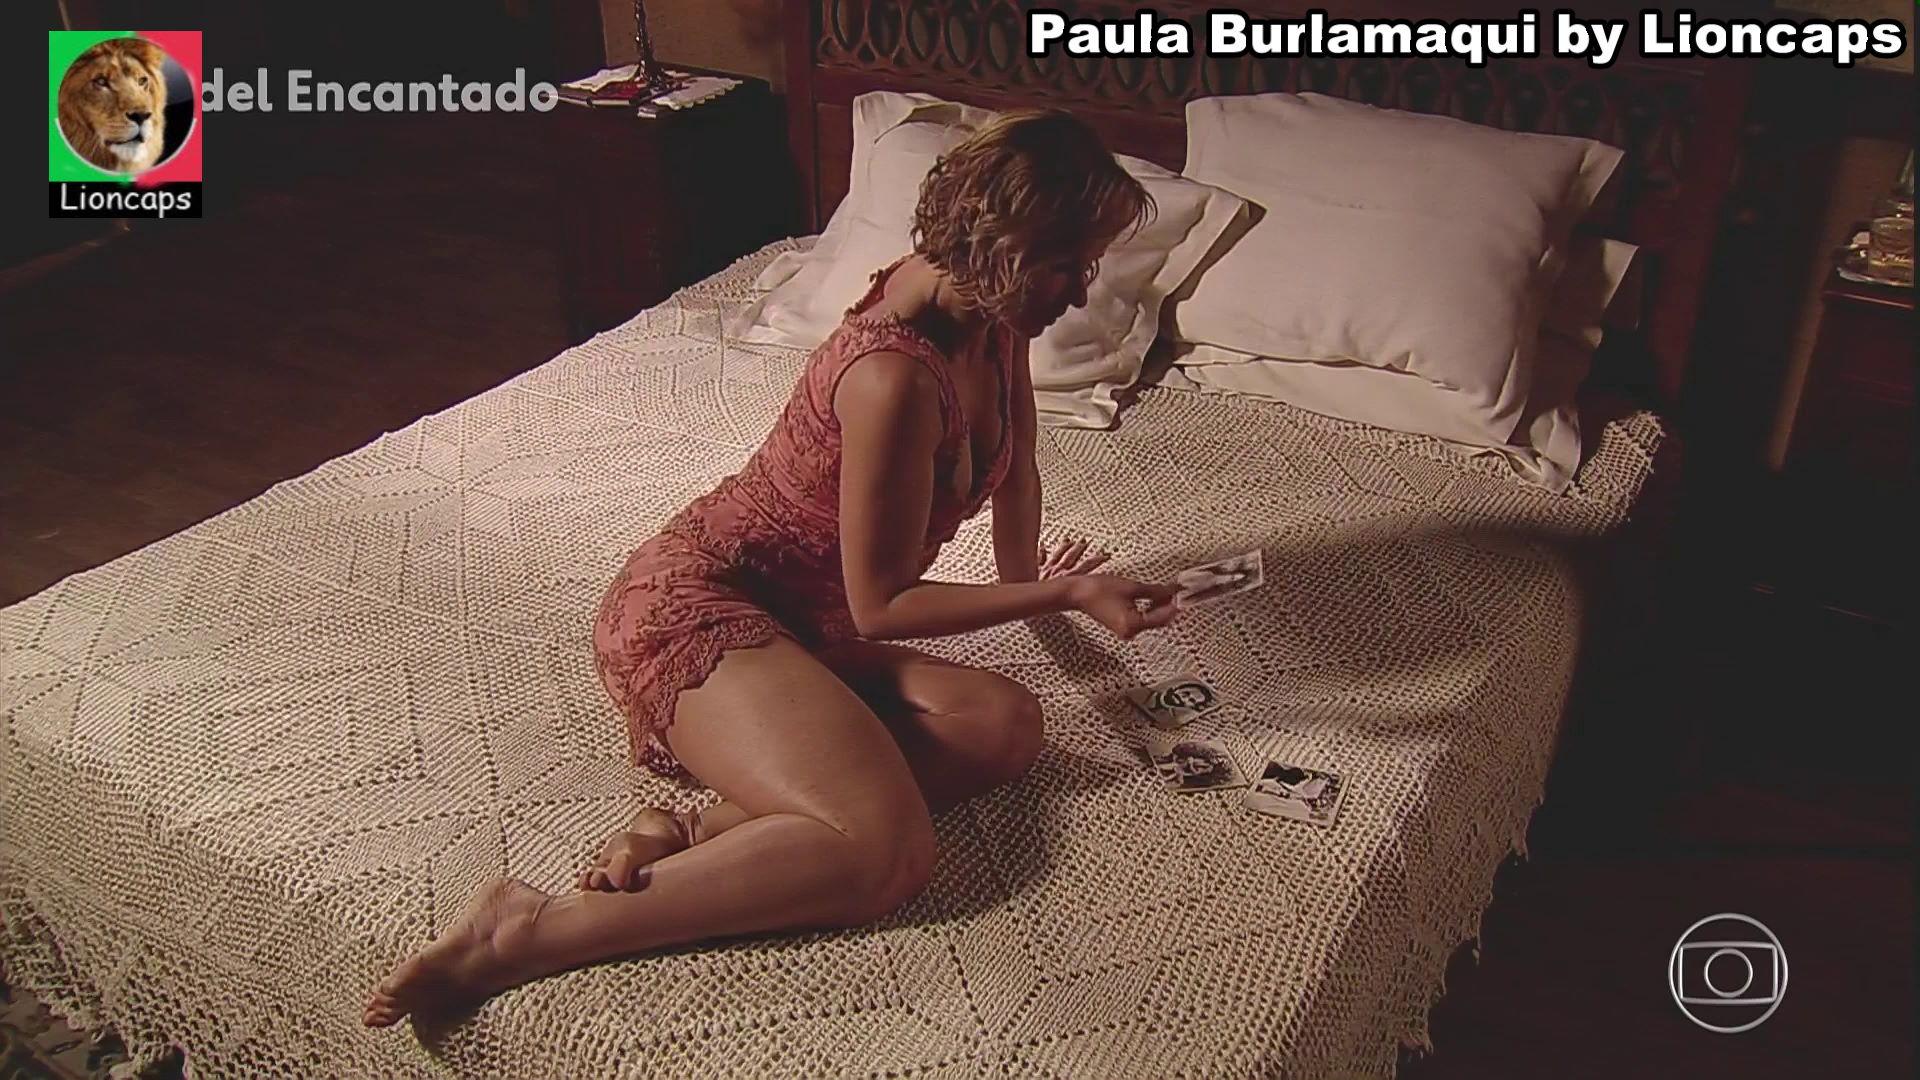 252274292_paula_burlamaqui_vs200105_0646_122_582lo.JPG